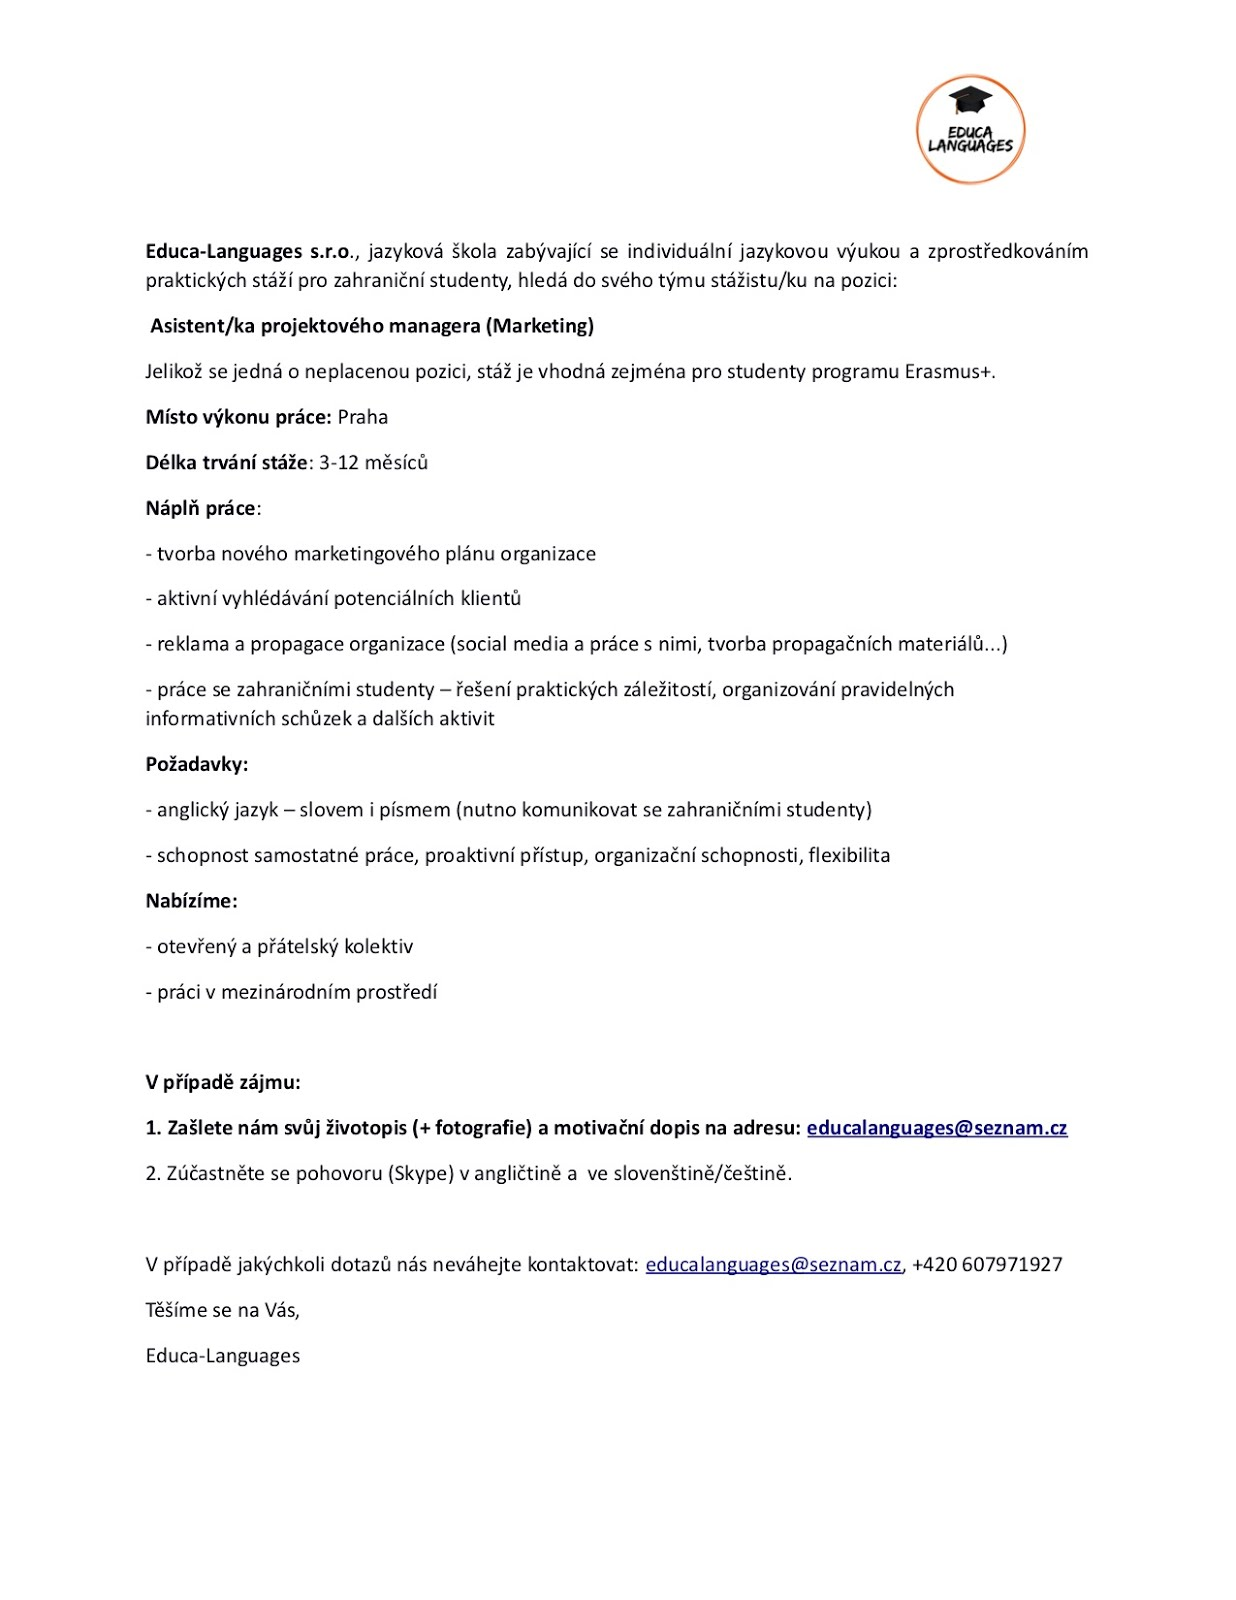 Notice Board Erasmus Traineeship Job Offer